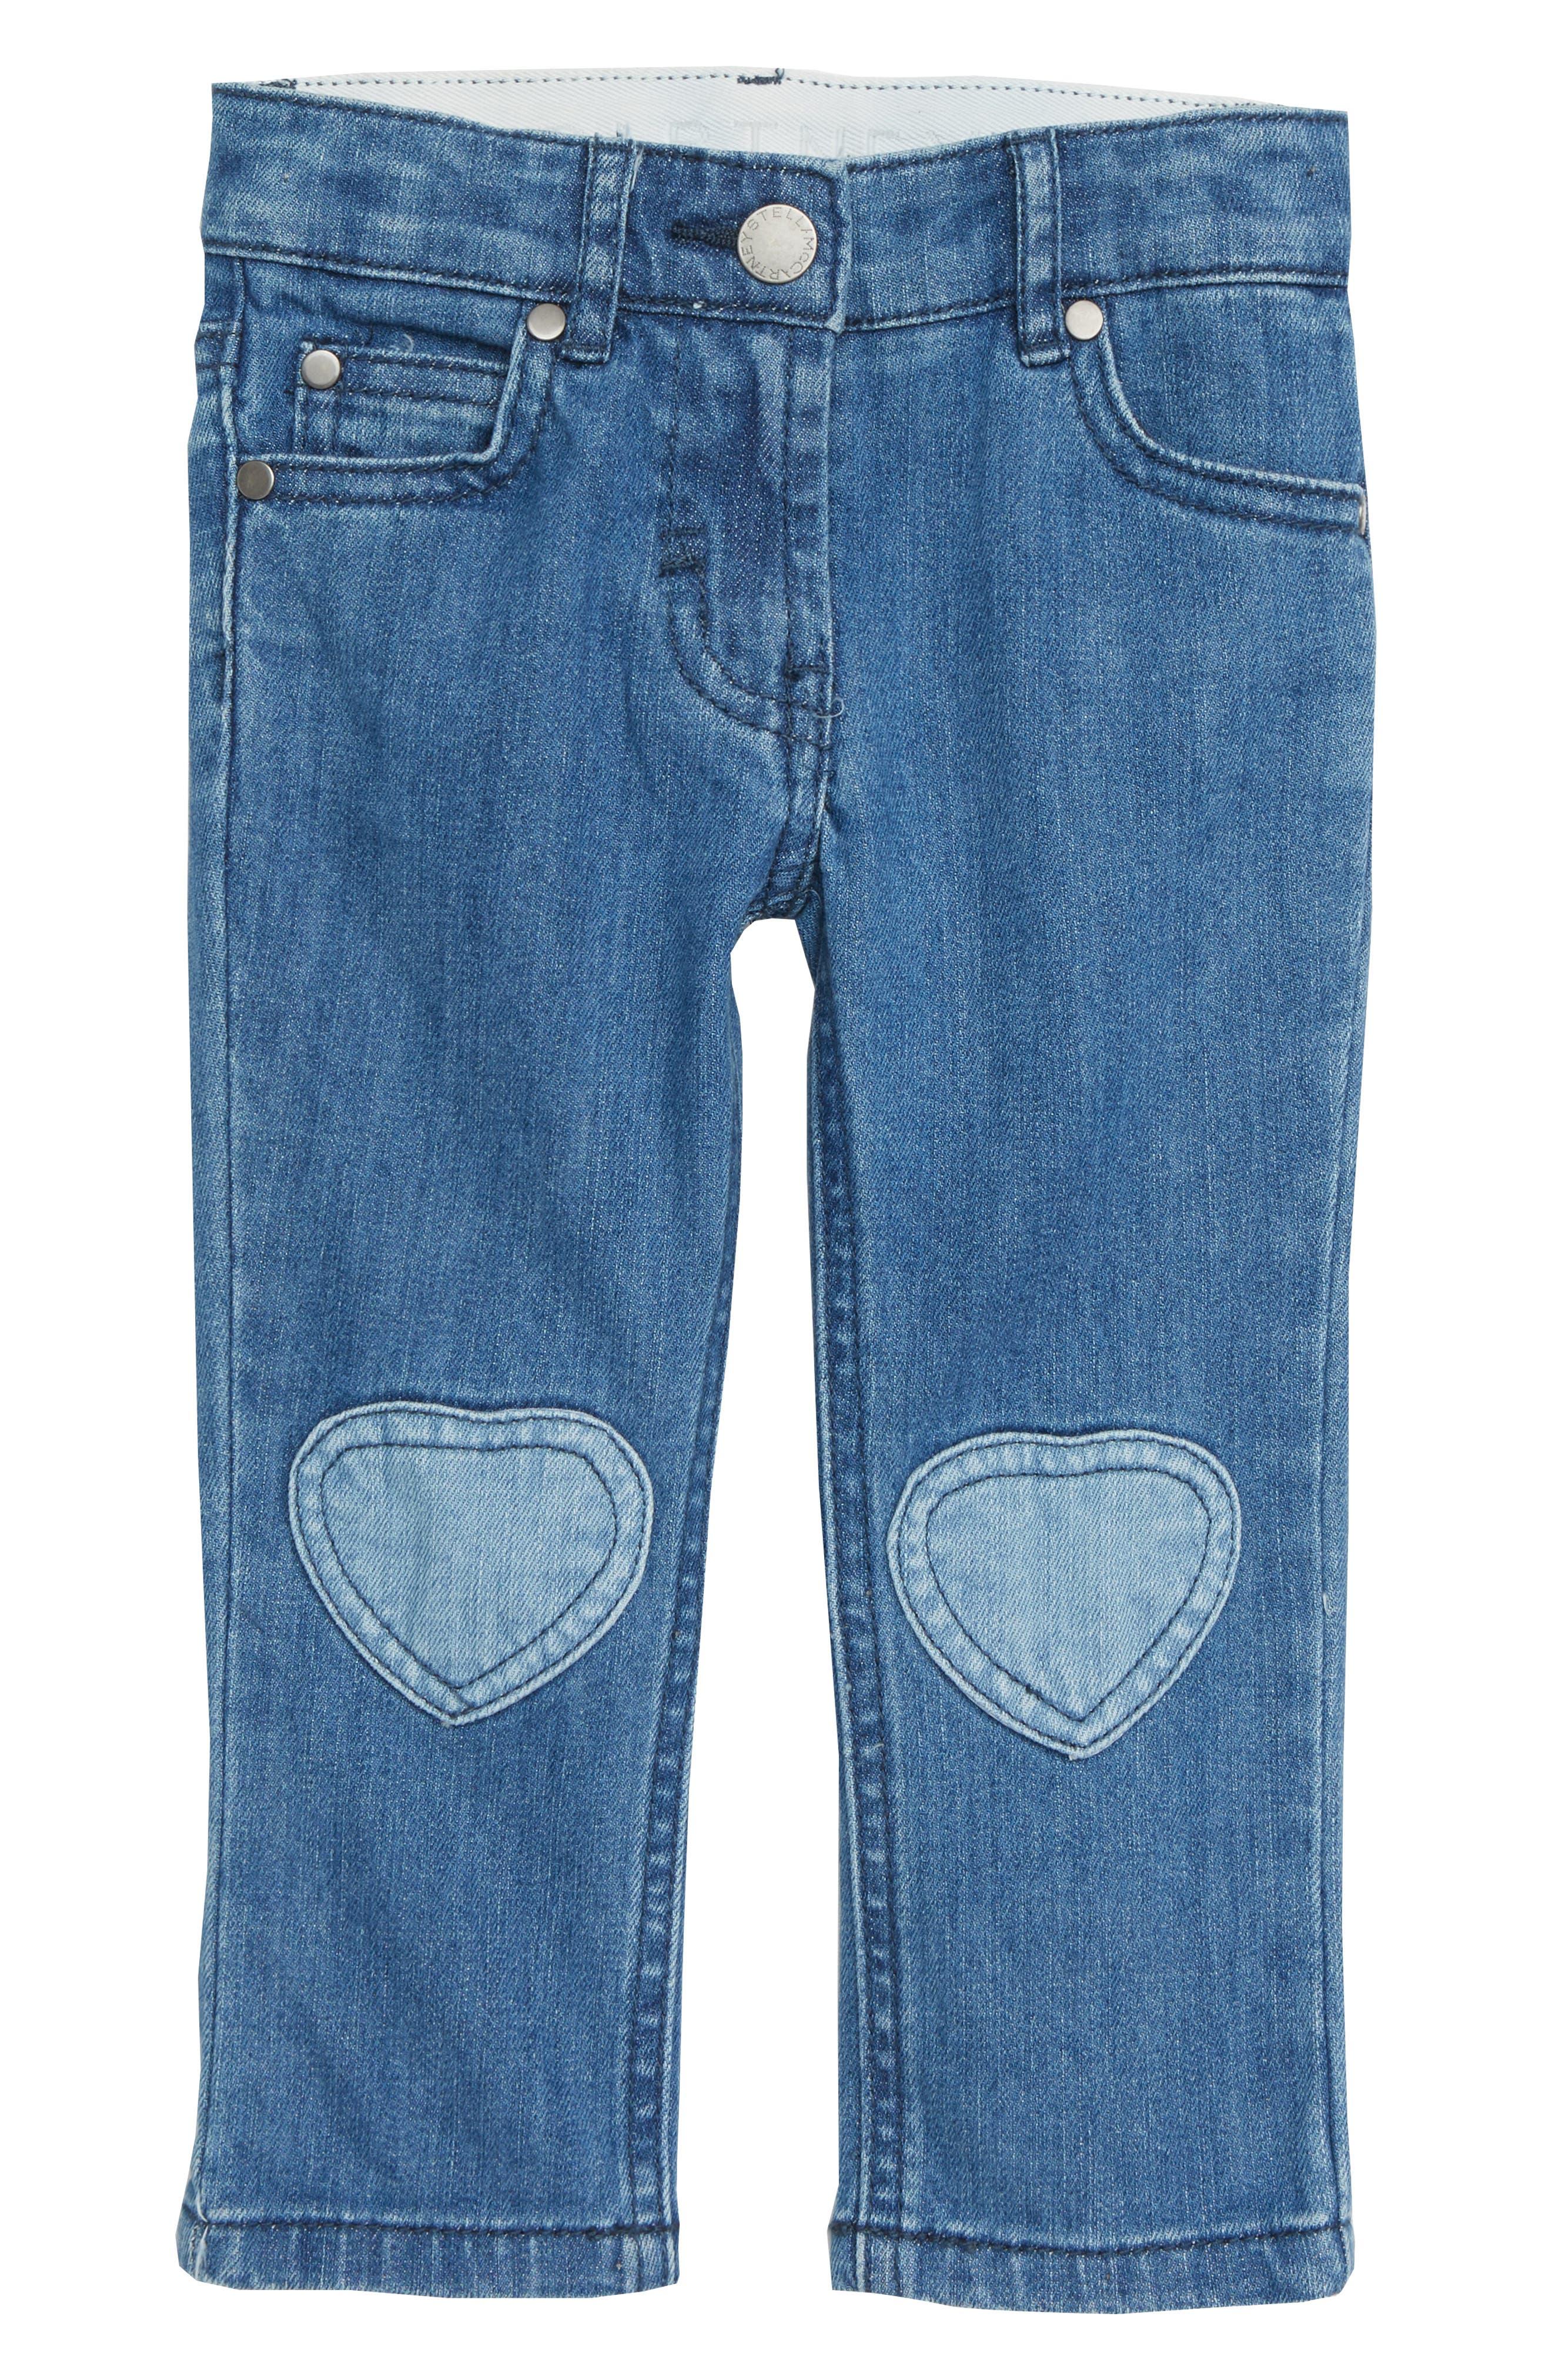 Heart Patch Straight Leg Jeans,                             Main thumbnail 1, color,                             BLUE